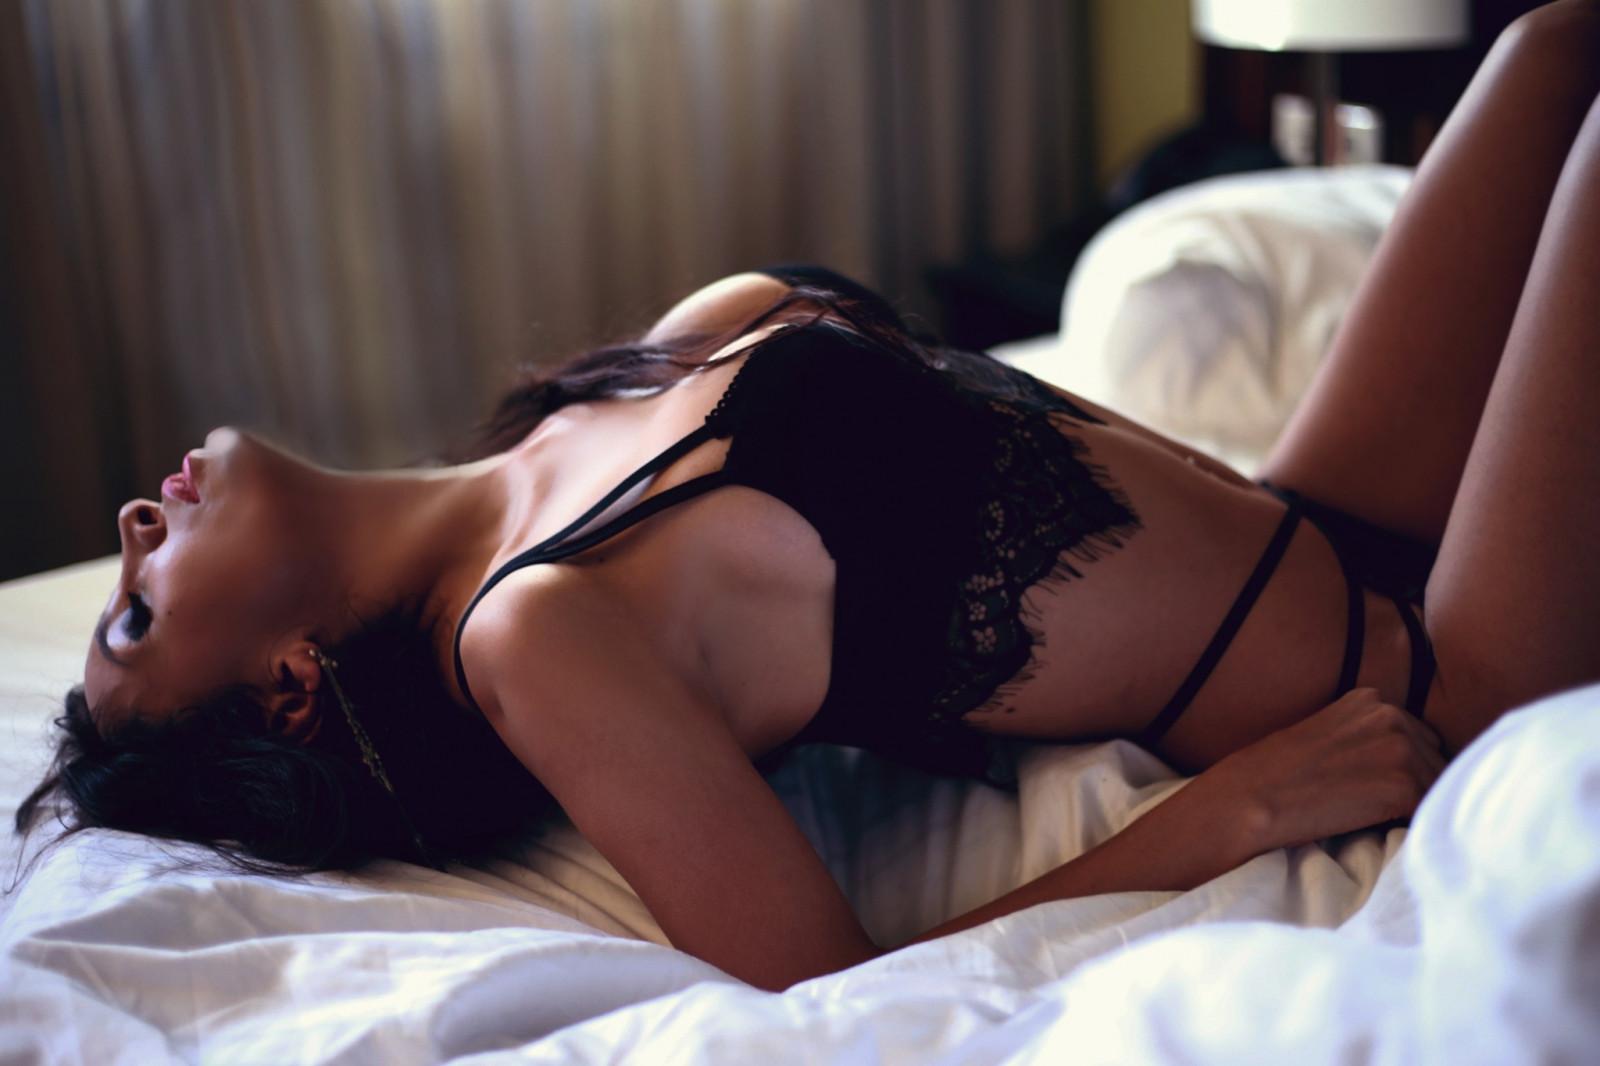 Фотки интимные на кровати